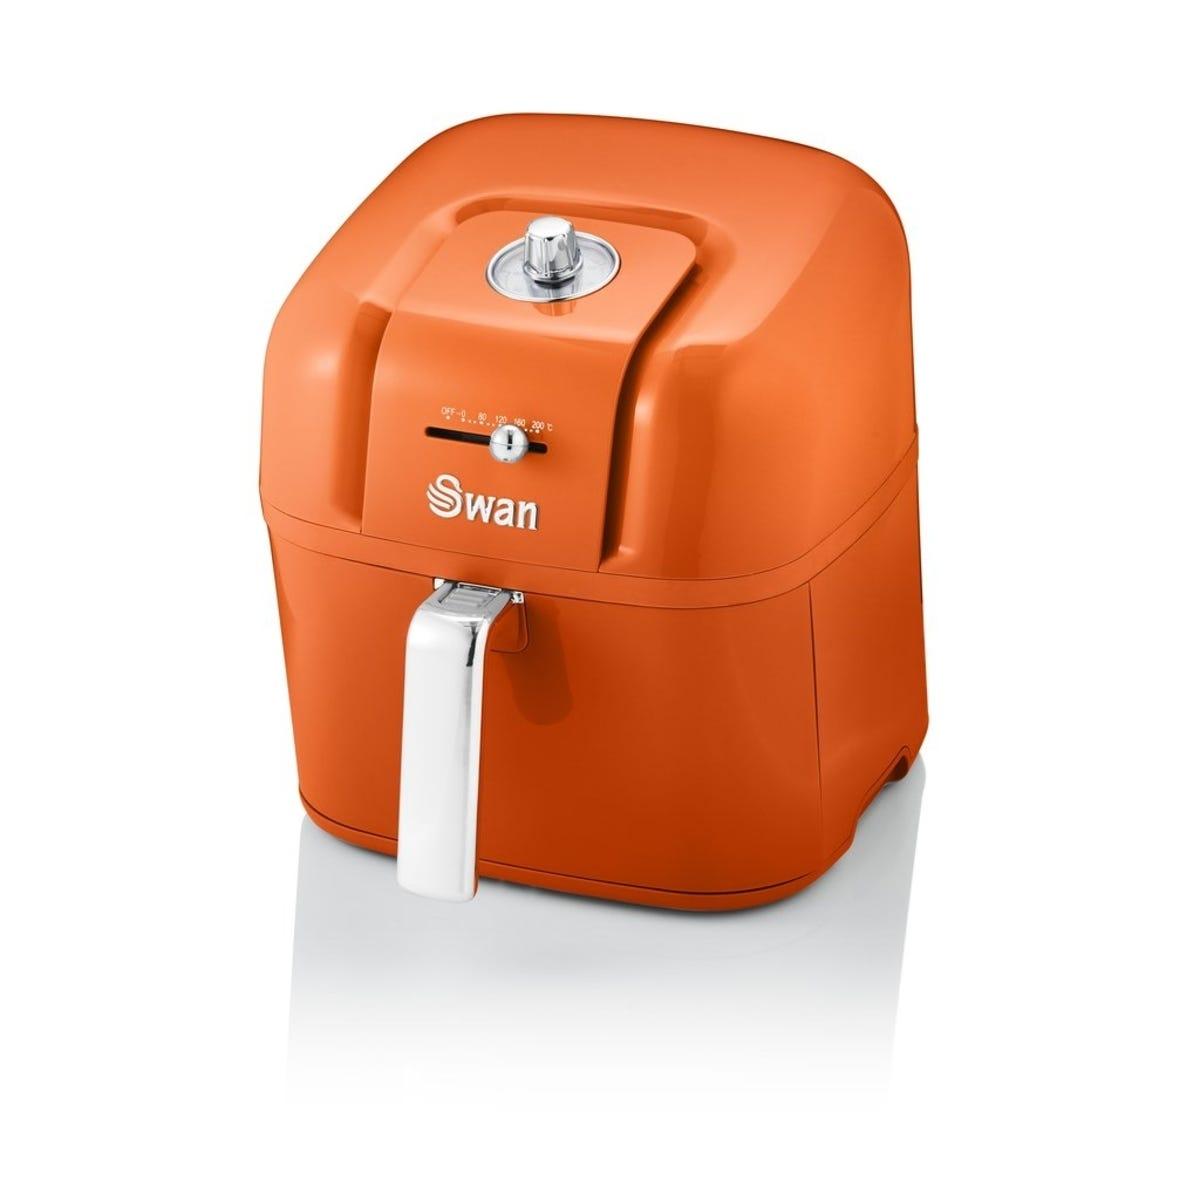 Swan SD10510ON 6L Retro Manual Air Fryer - Orange